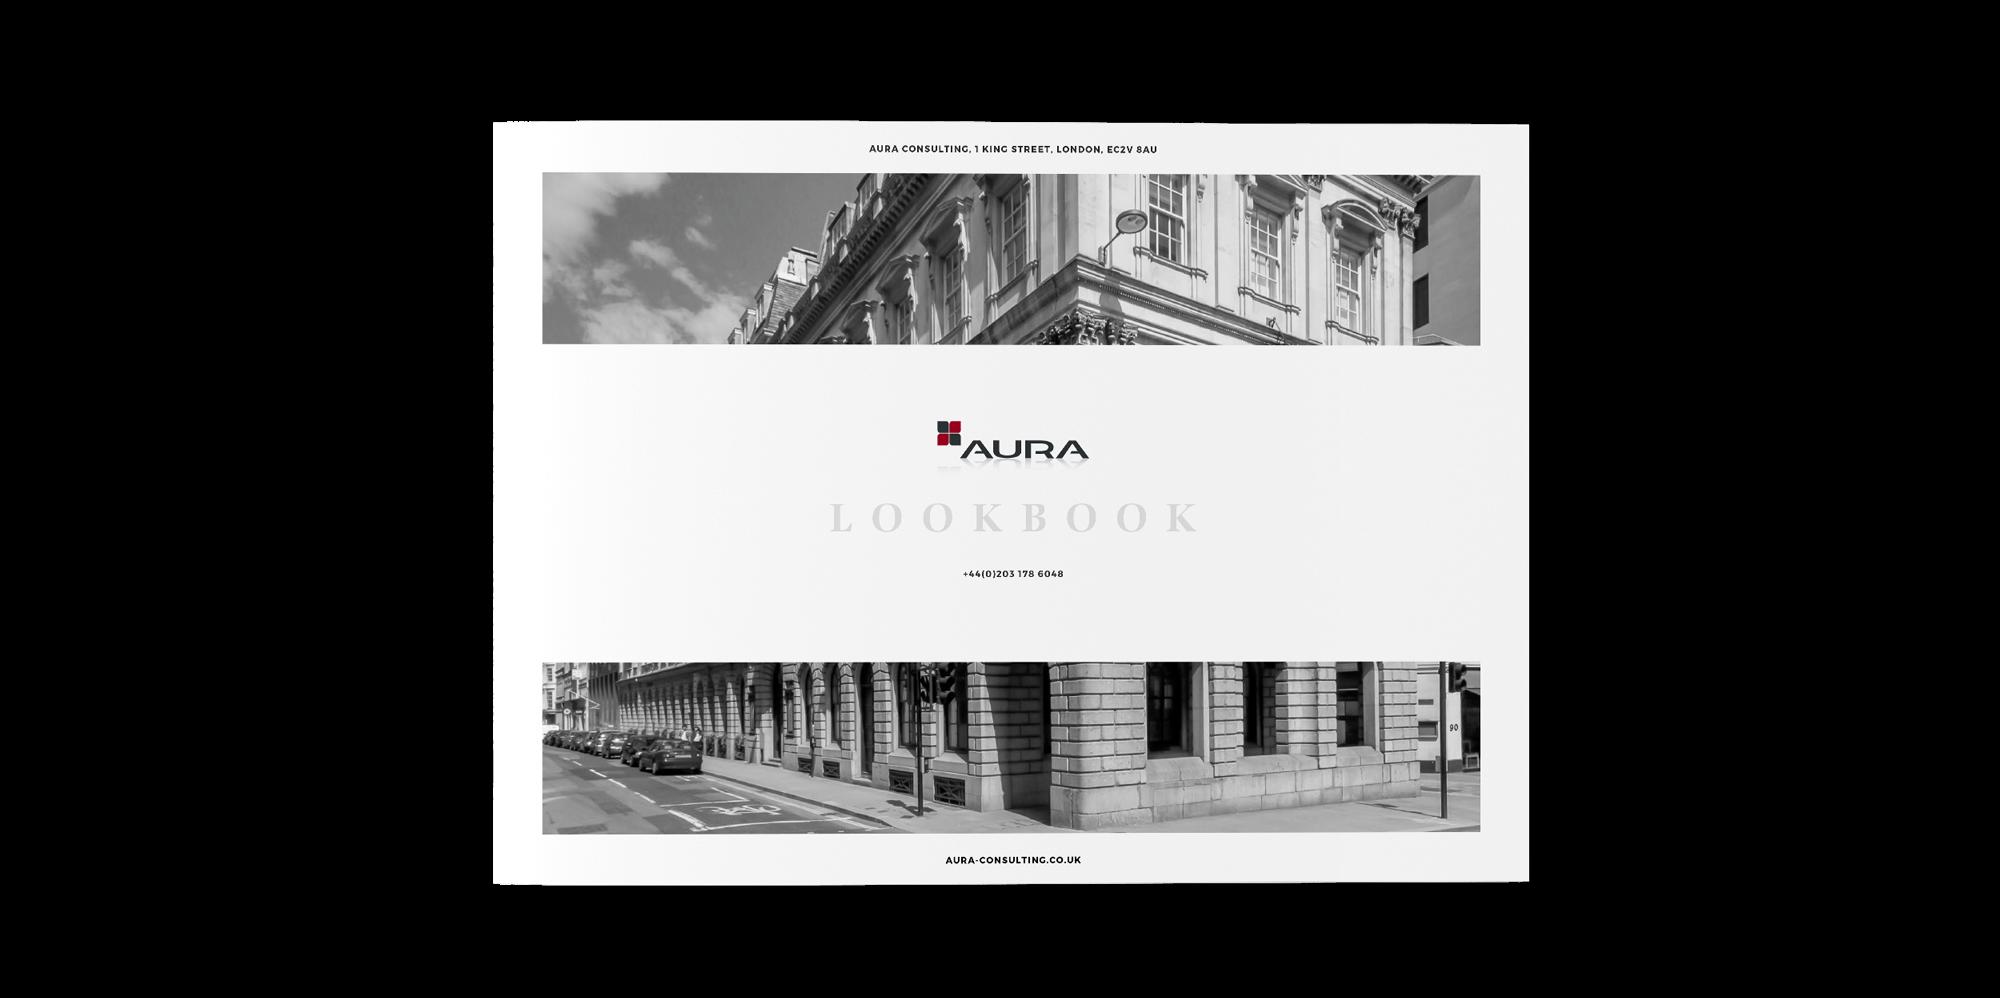 aura-brochure-mockup-cover-1